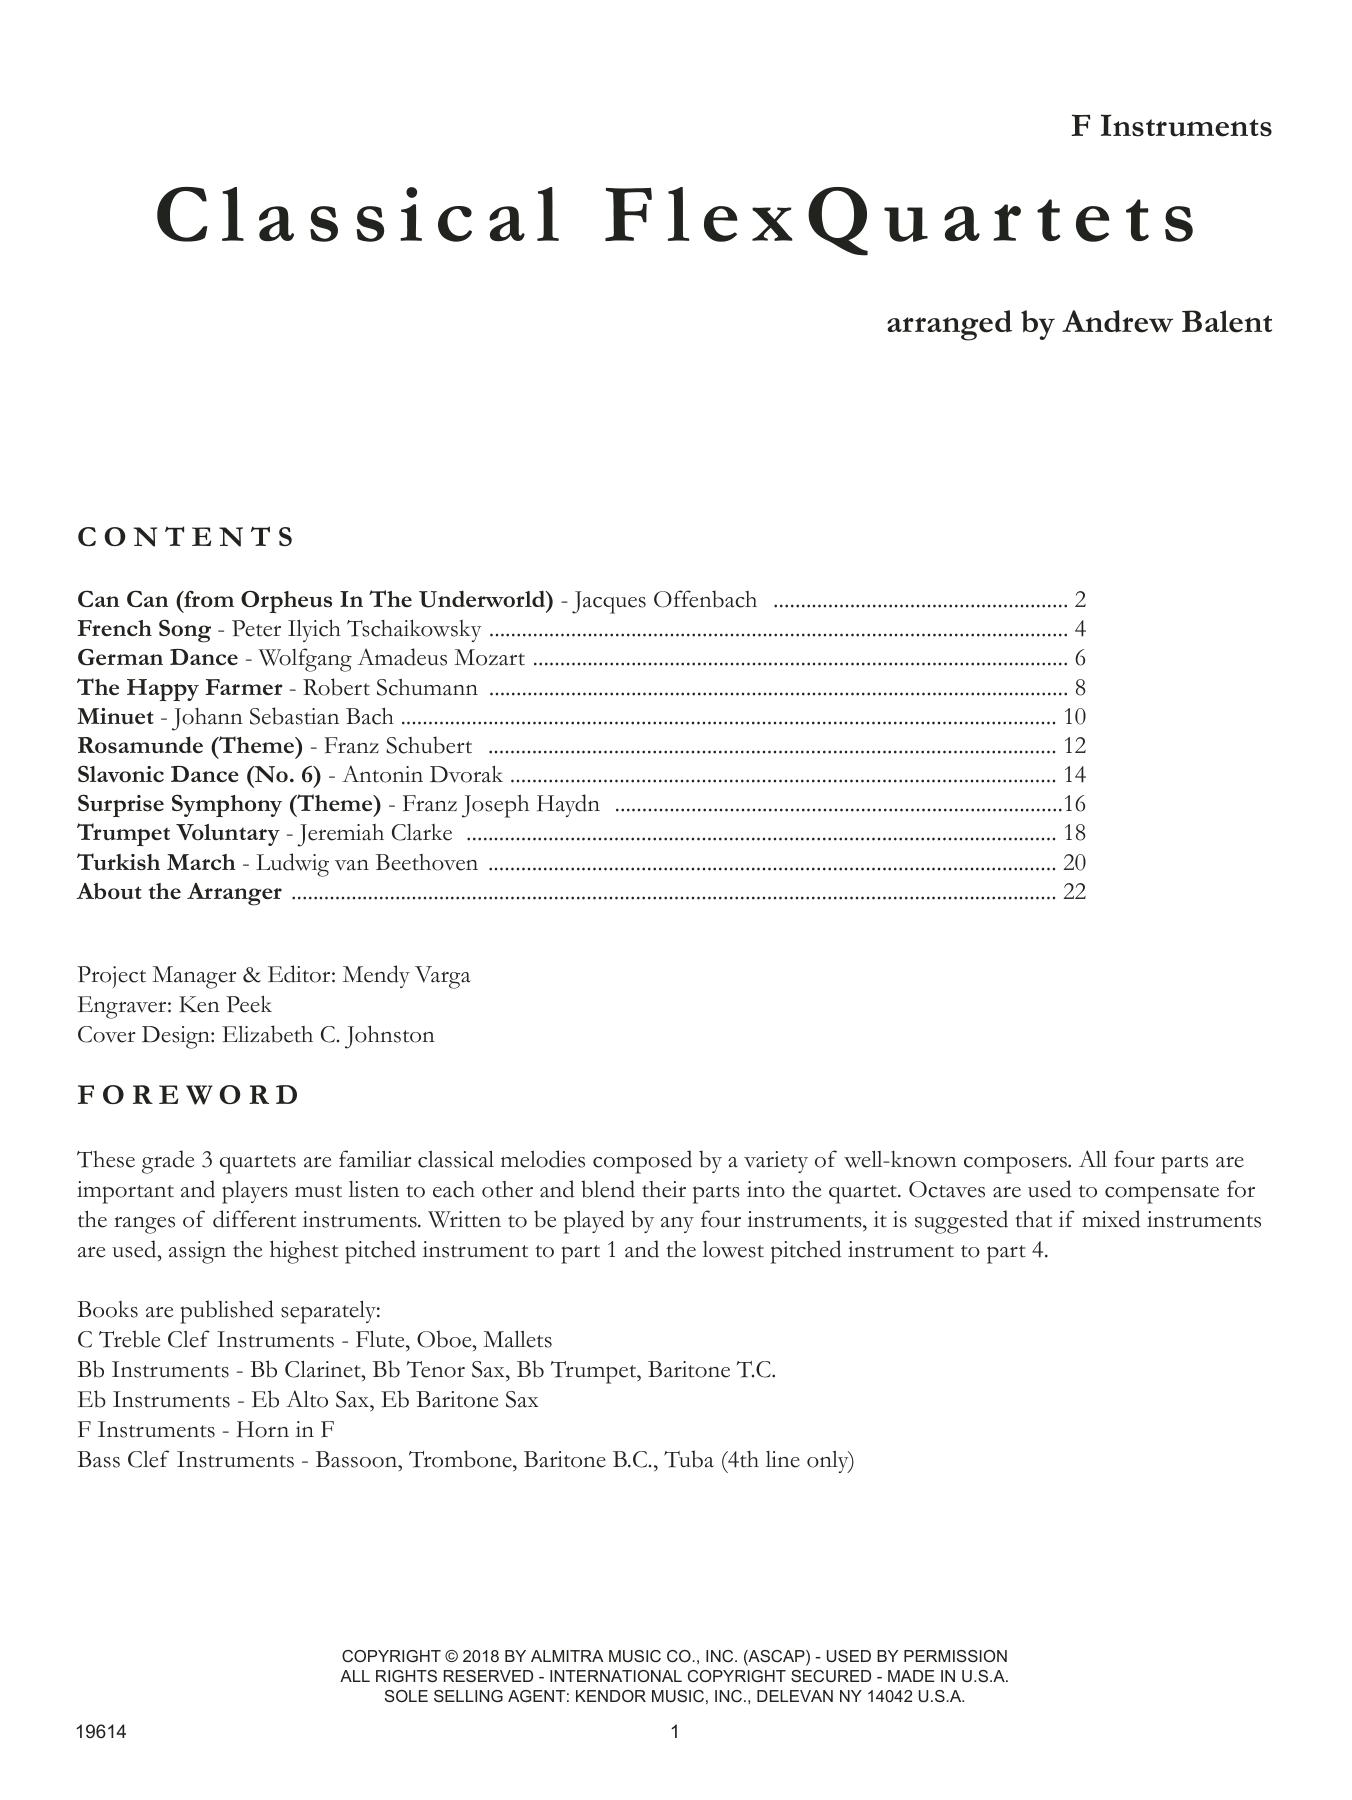 Classical Flexquartets - F Instruments Sheet Music